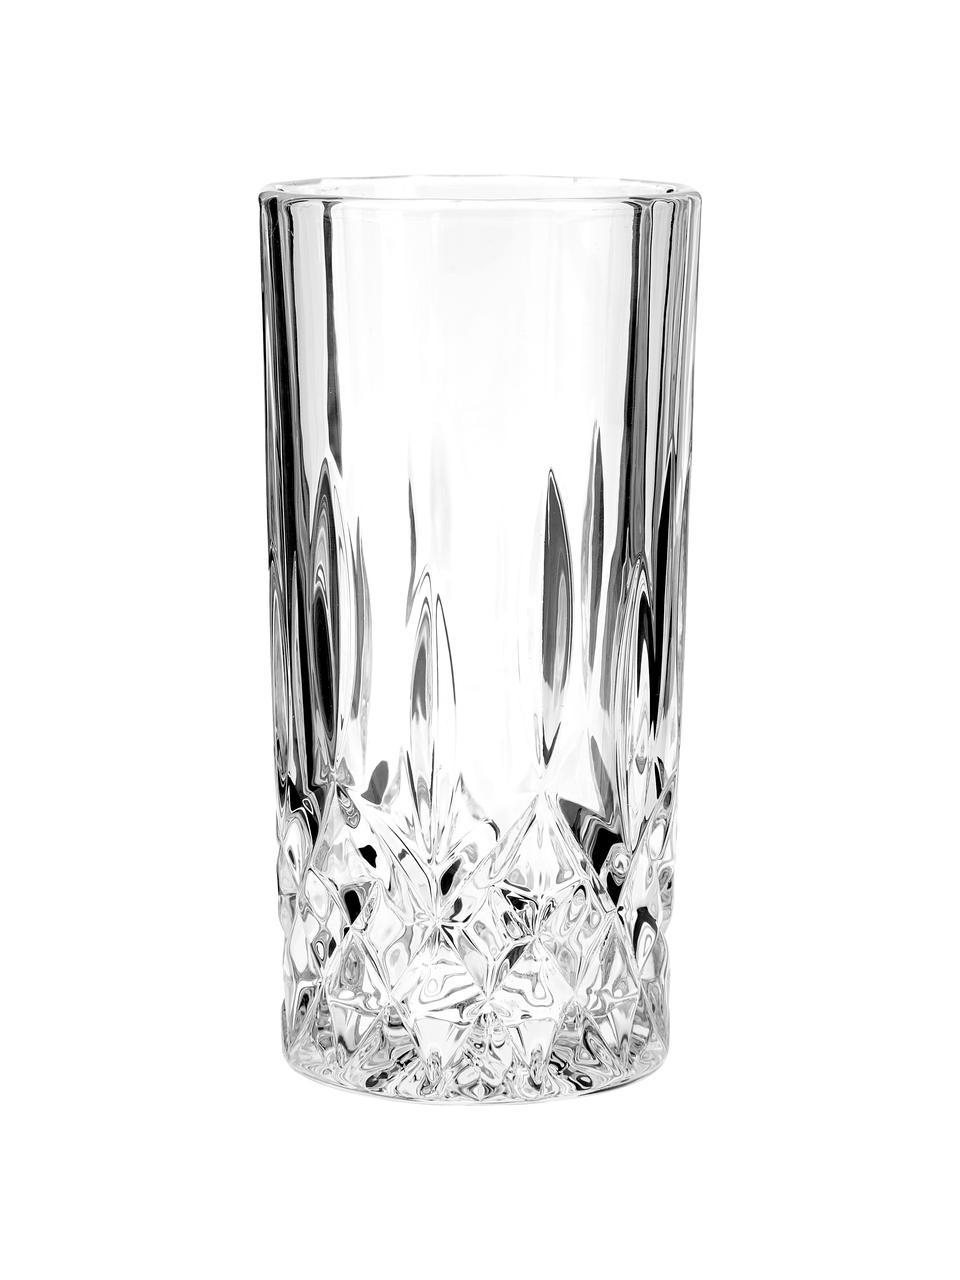 Verre à longdrink cristal George, 4pièces, Transparent